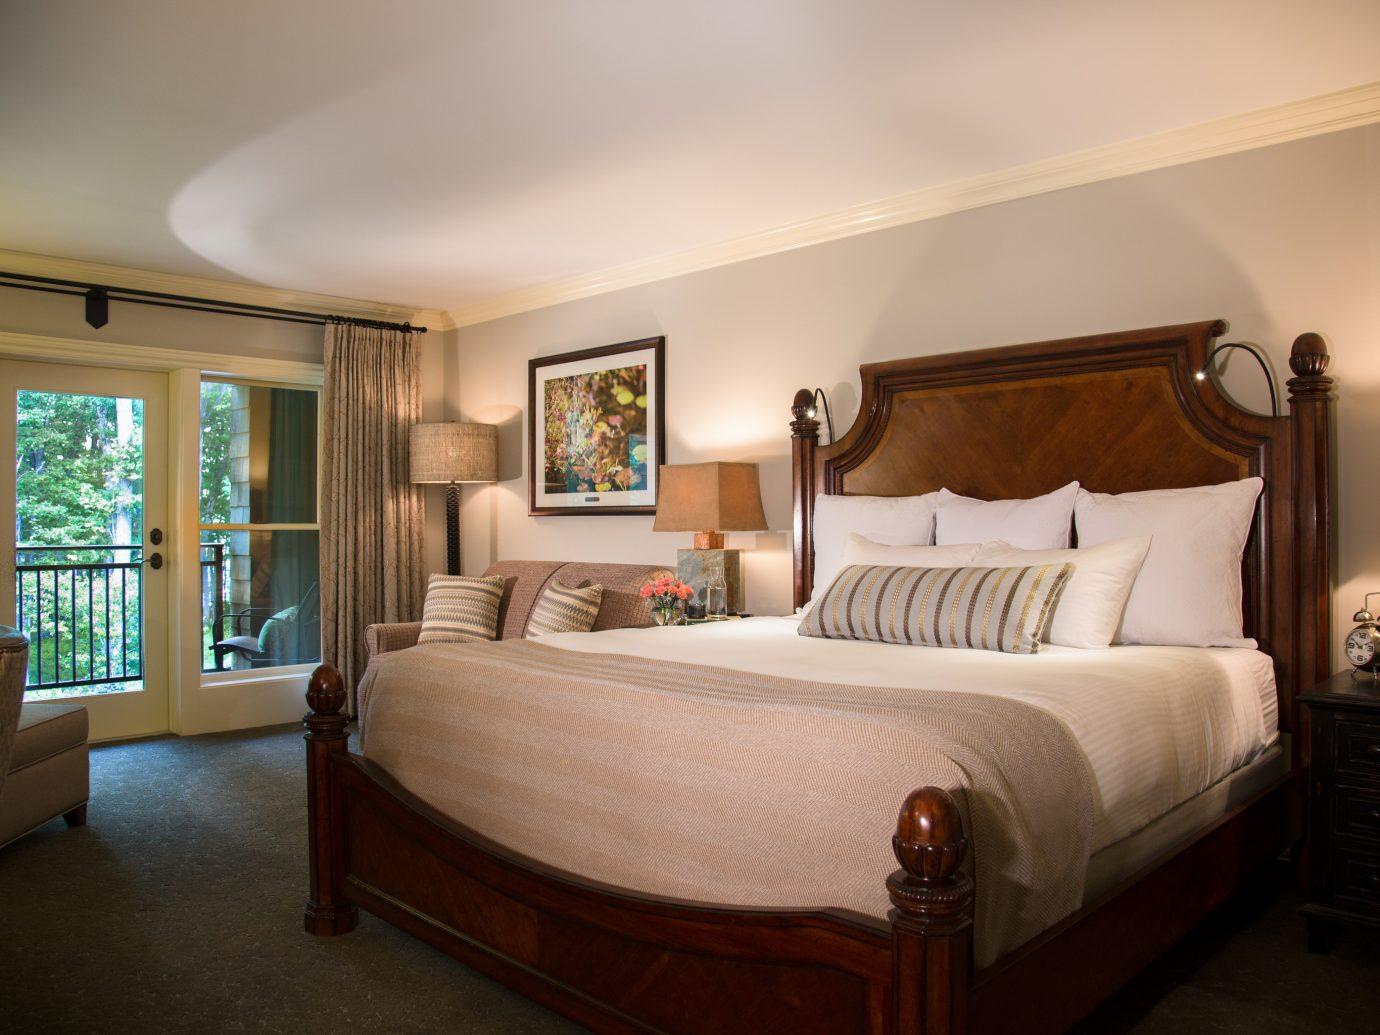 Bedroom at the Lodge at Woodloch